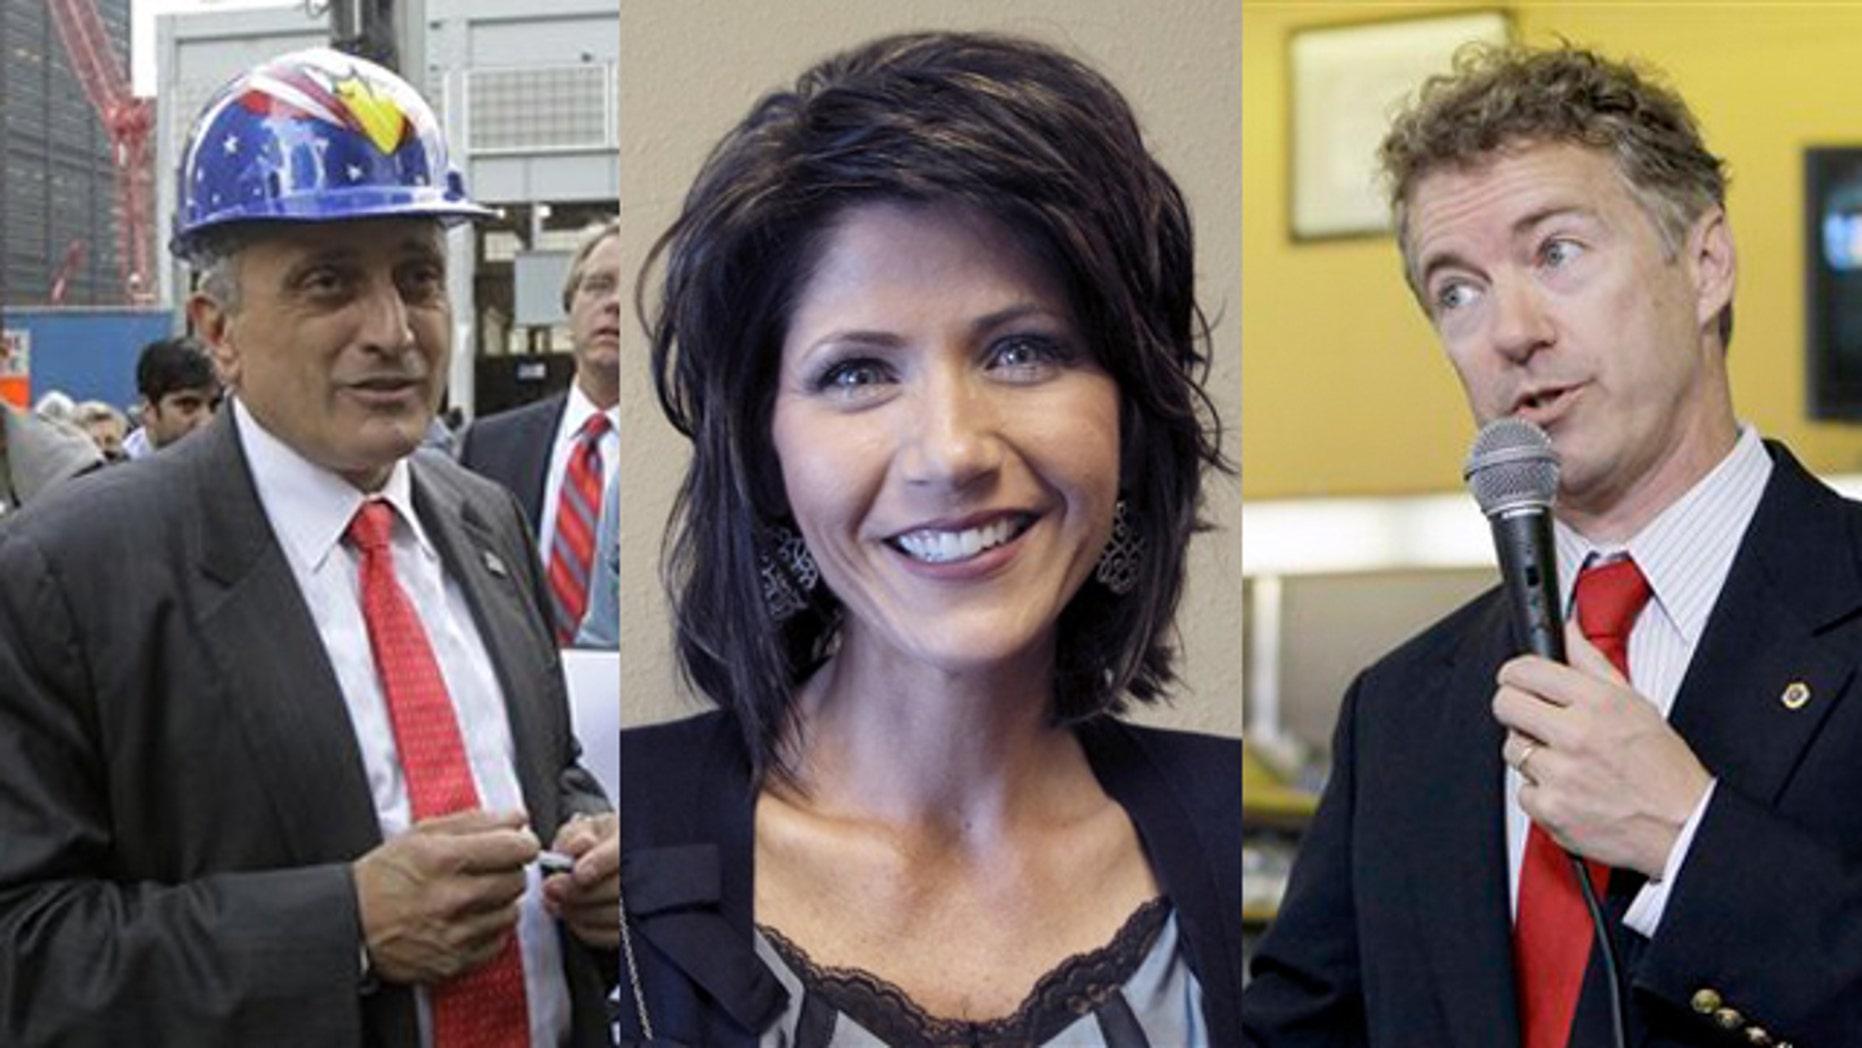 Shown here are New York gubernatorial candidate Carl Paladino, left, South Dakota House candidate Kristi Noem, center, and Kentucky Senate candidate Rand Paul. (AP Photos)